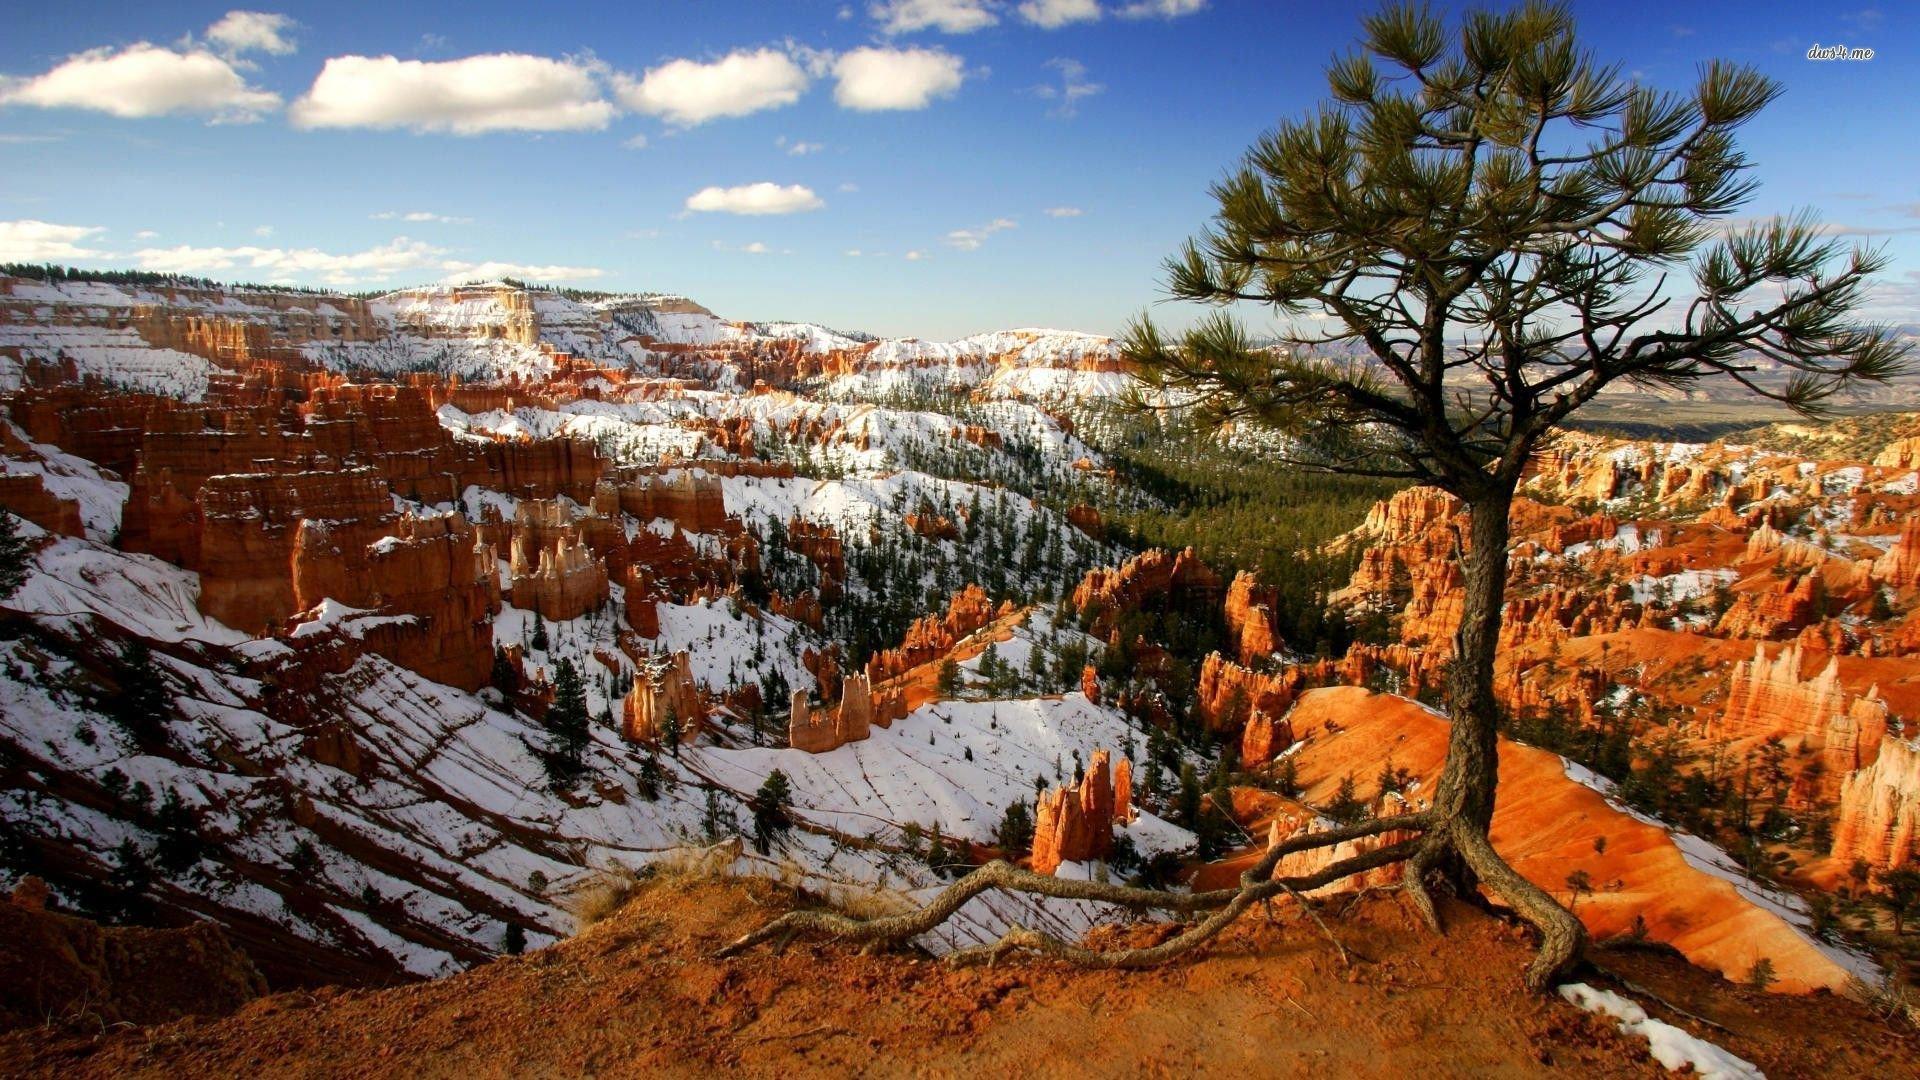 48 Bryce Canyon National Park Wallpapers On Wallpapersafari